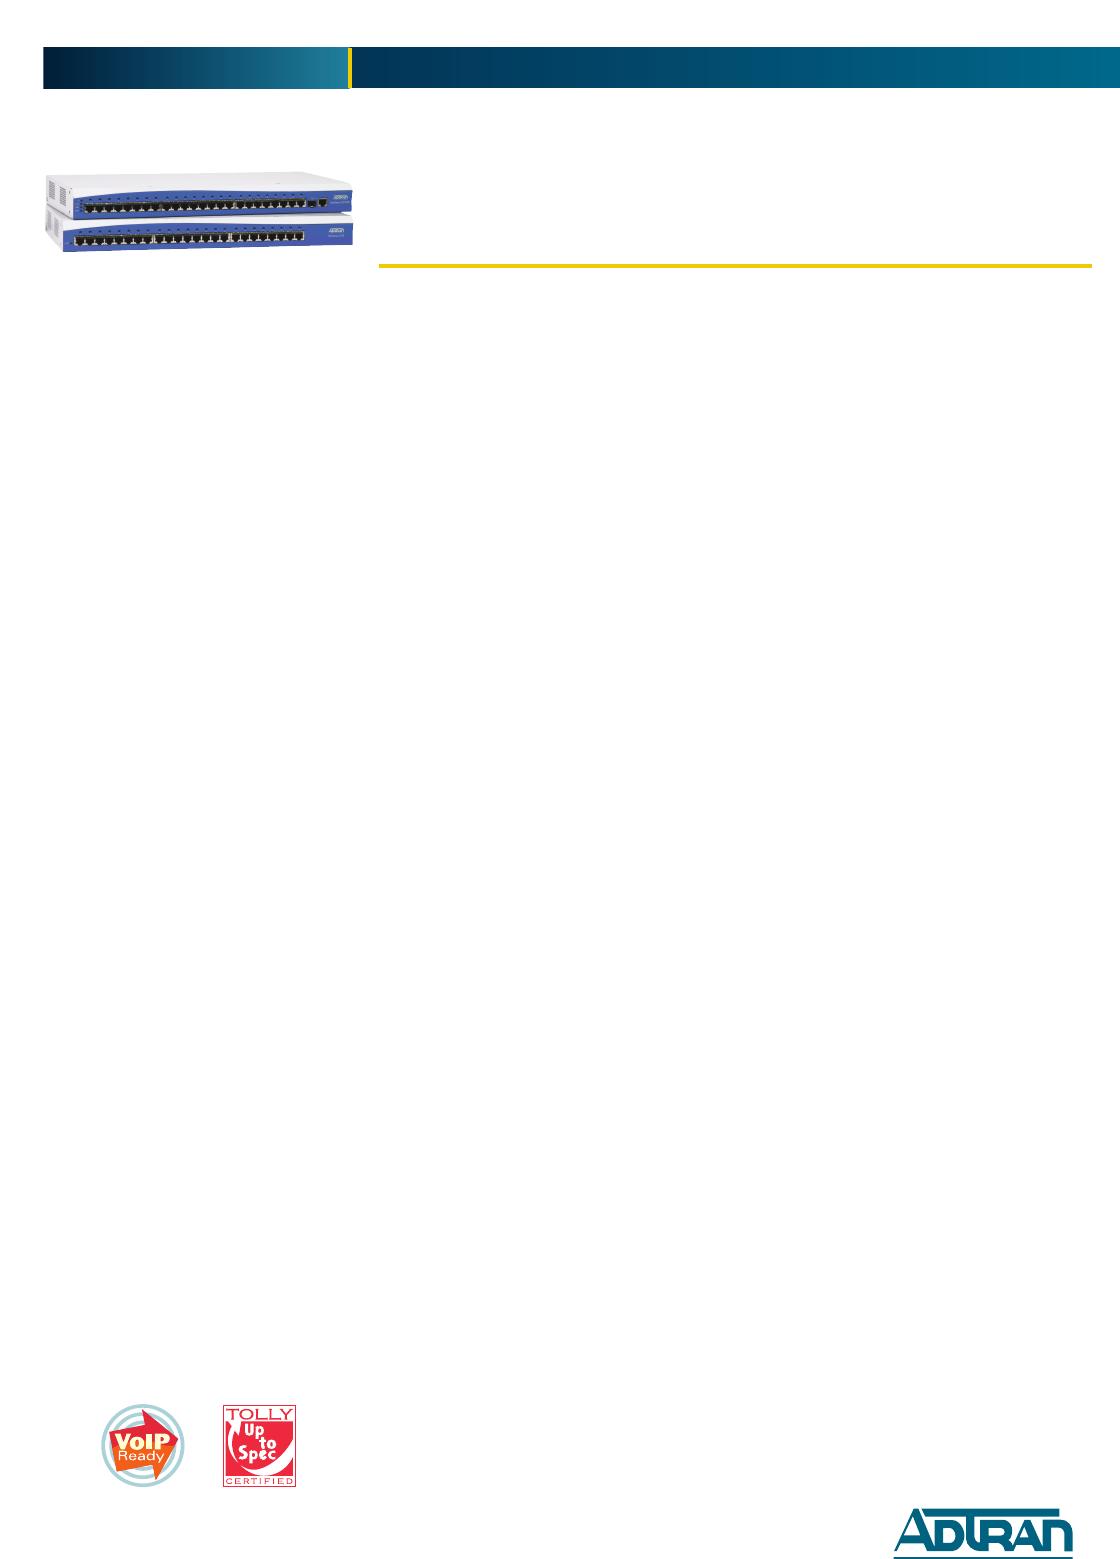 ADTRAN NETVANTA 1224 1200500L1 FAST ETHERNET SWITCH